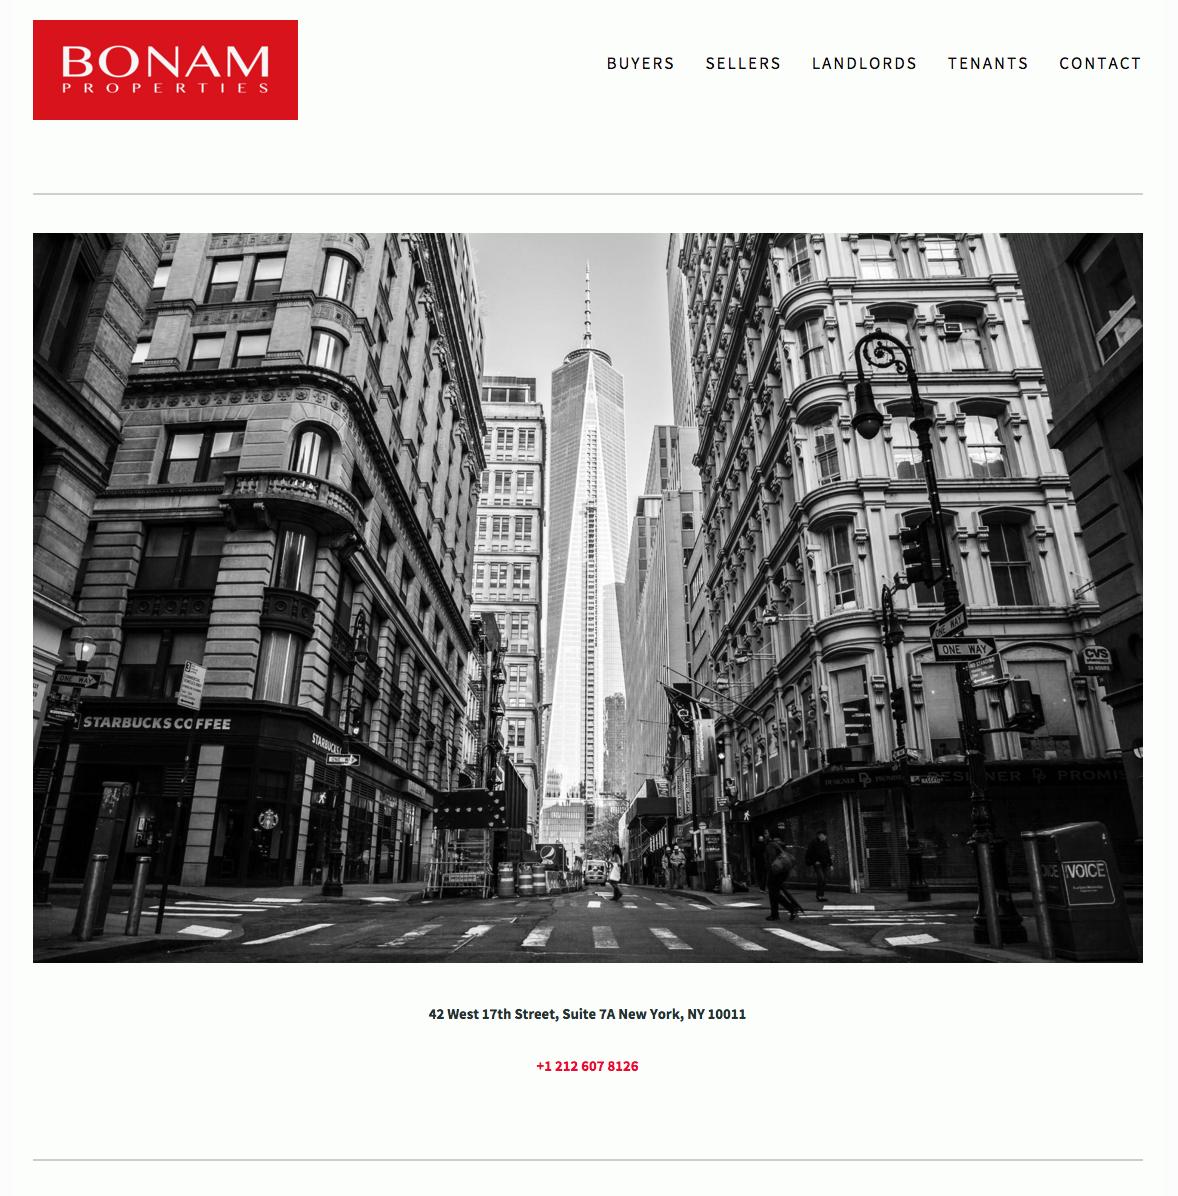 Bonam Properties